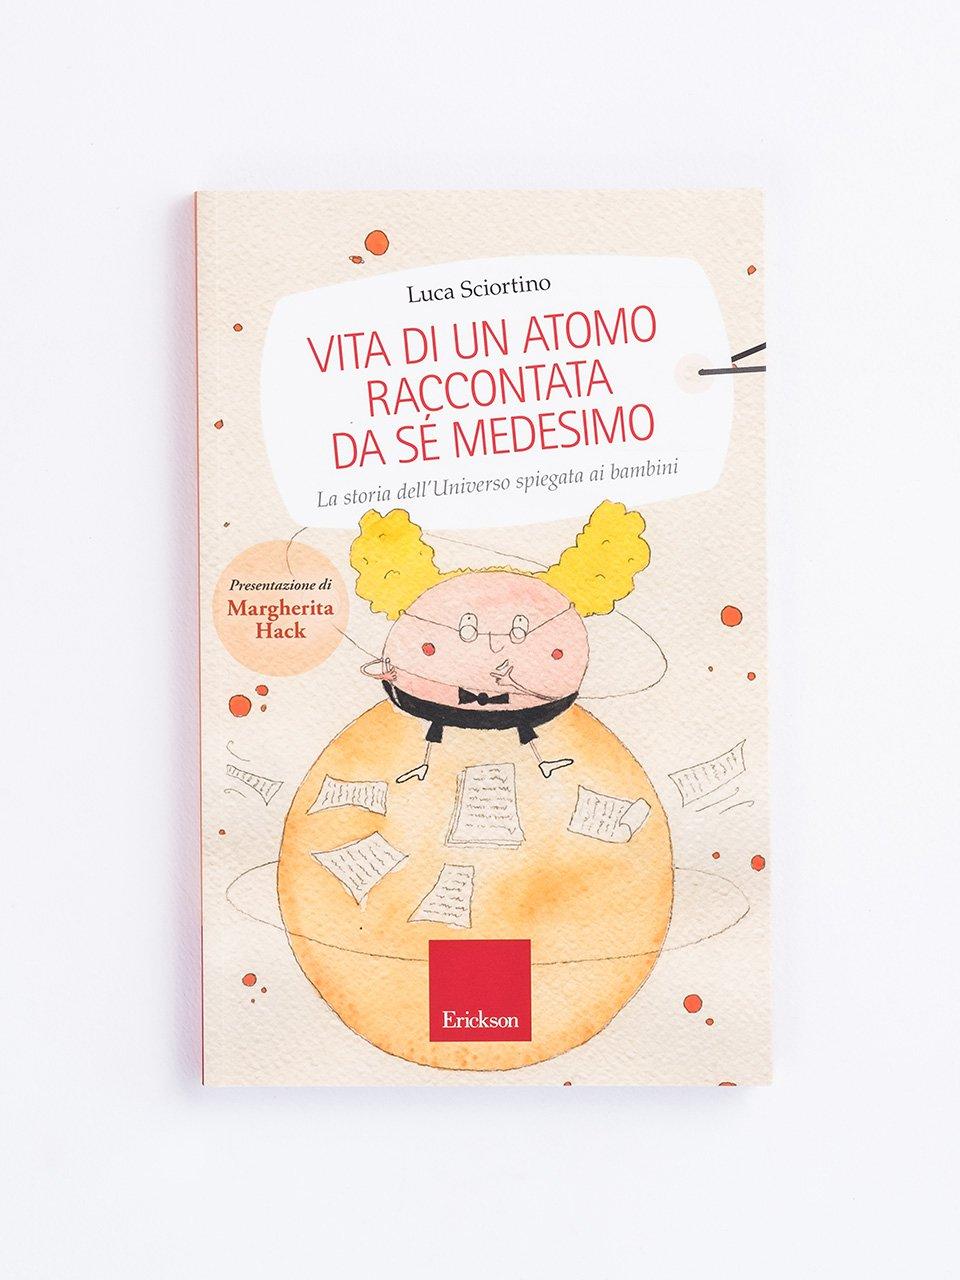 Vita di un atomo raccontata da se medesimo - Mia nonna era un pesce - Libri - Erickson